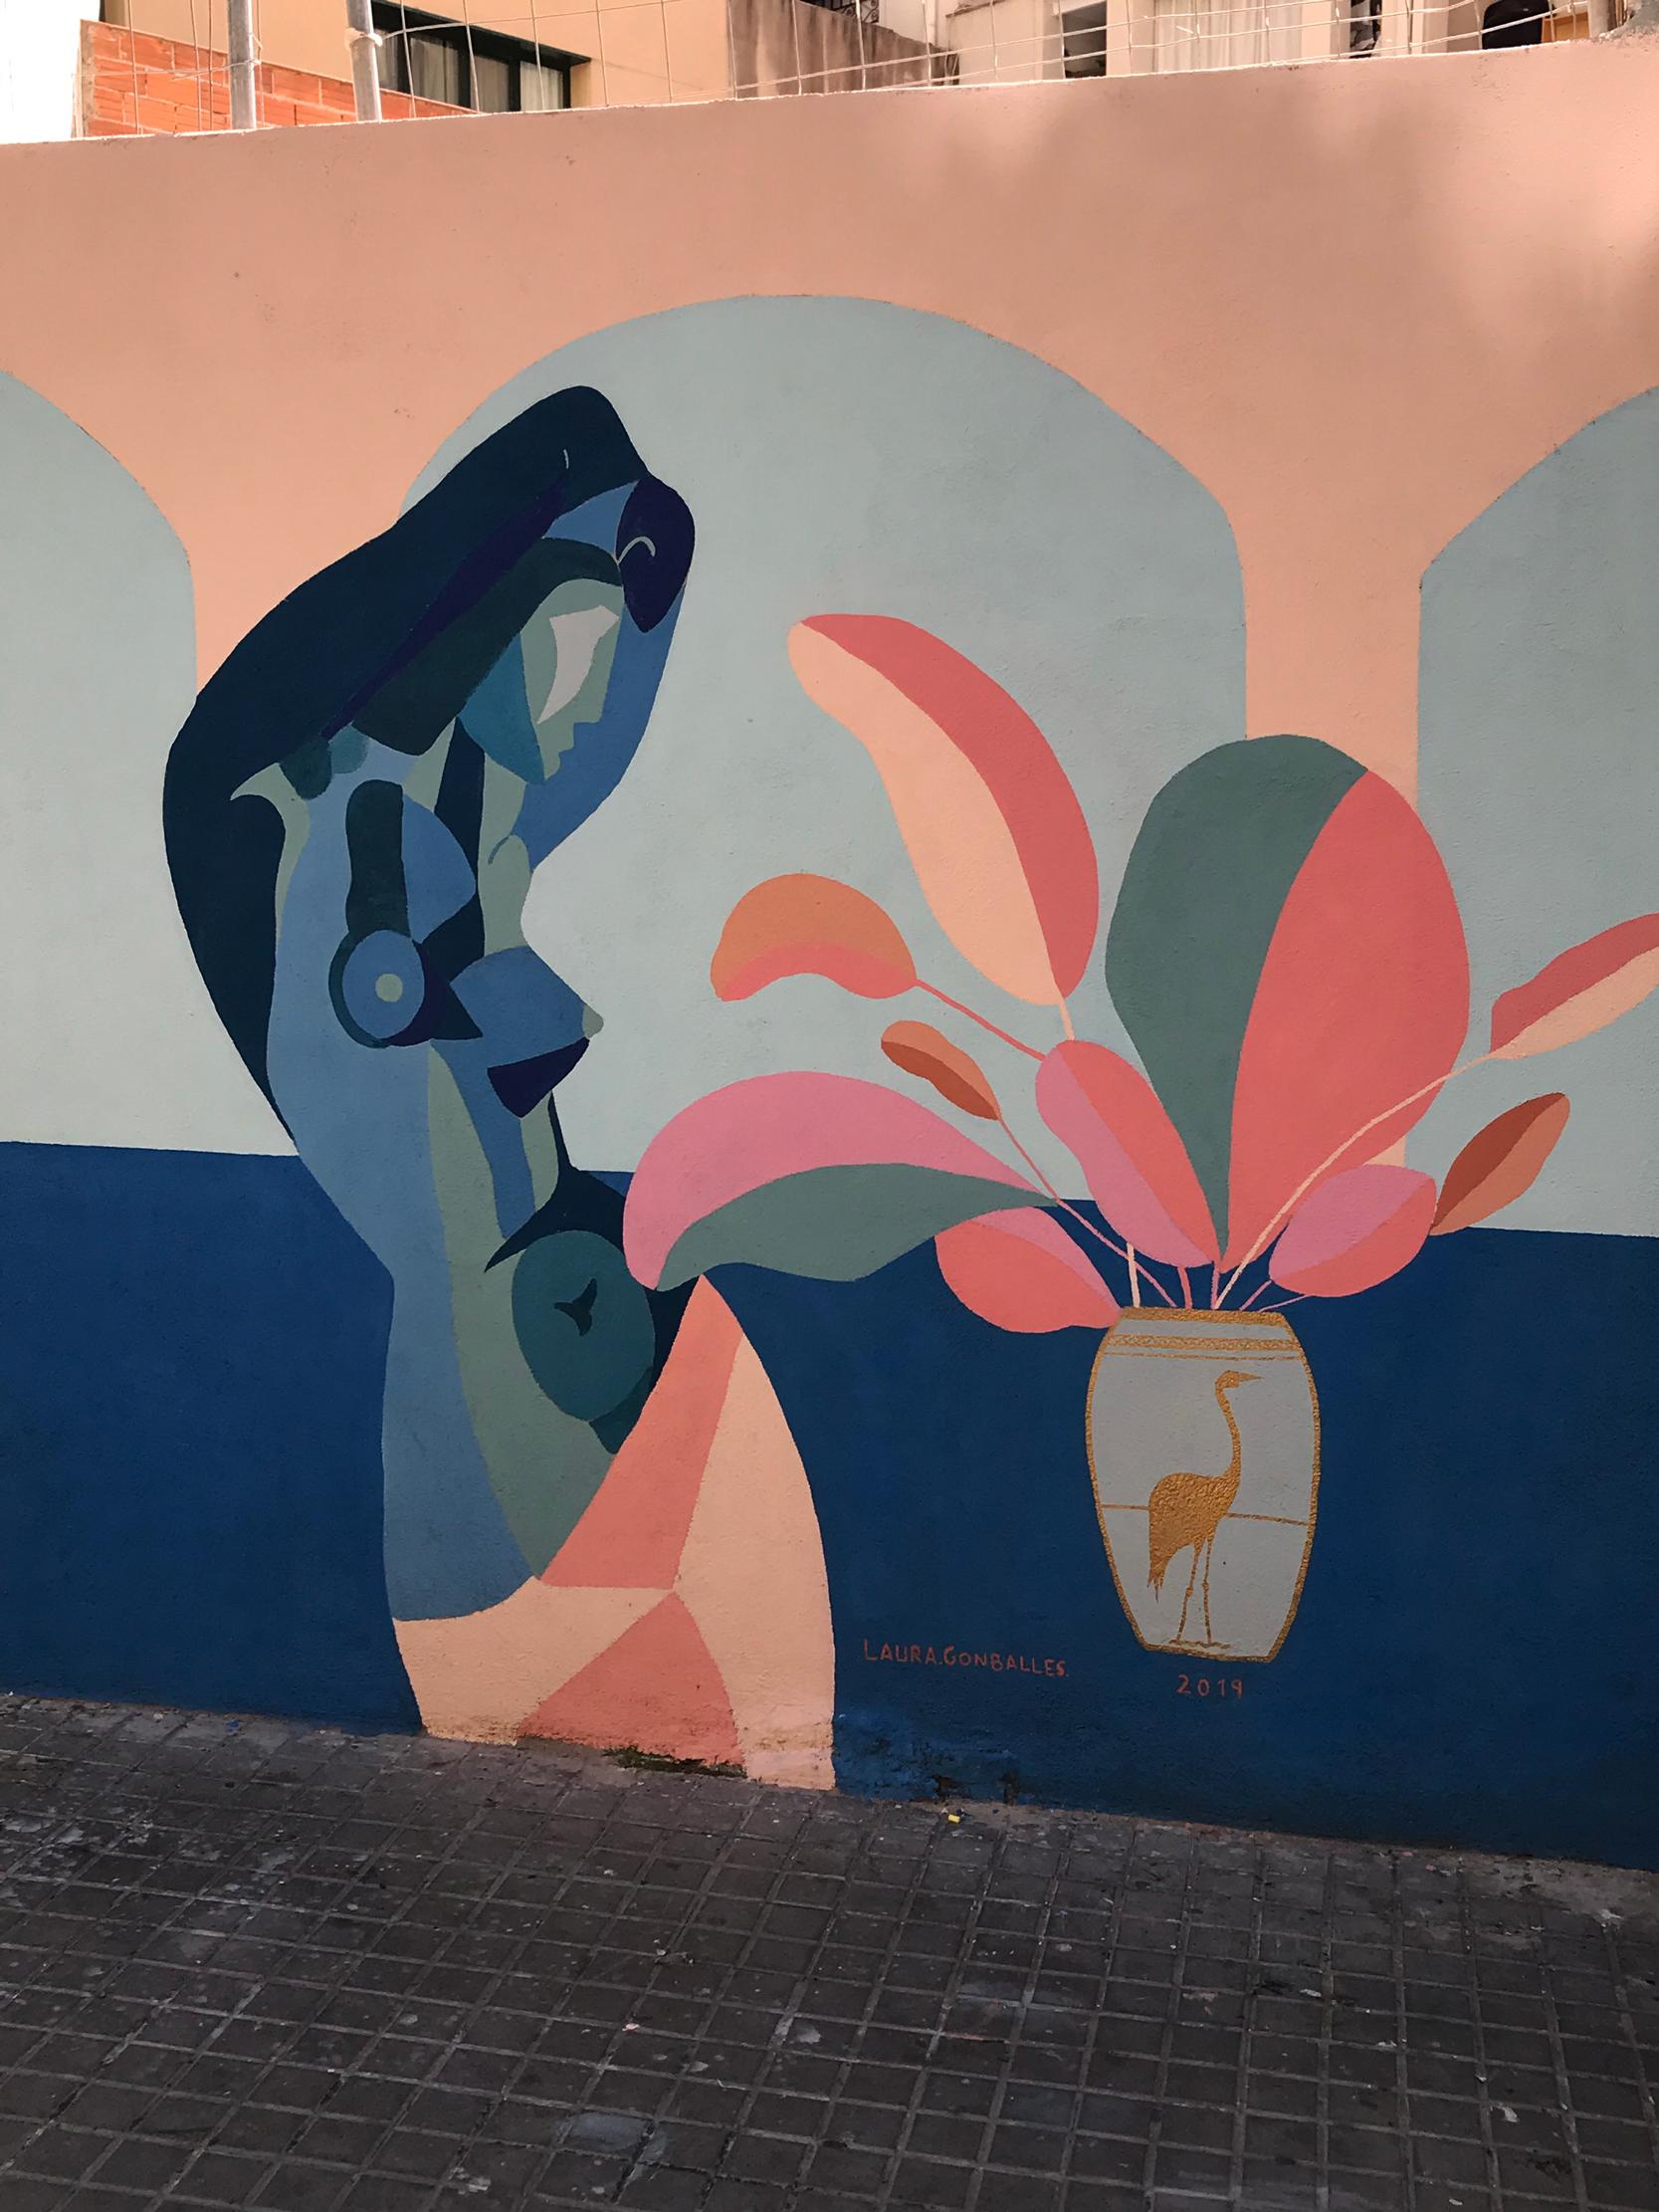 arte urbano Laura Gonballes Barcelona